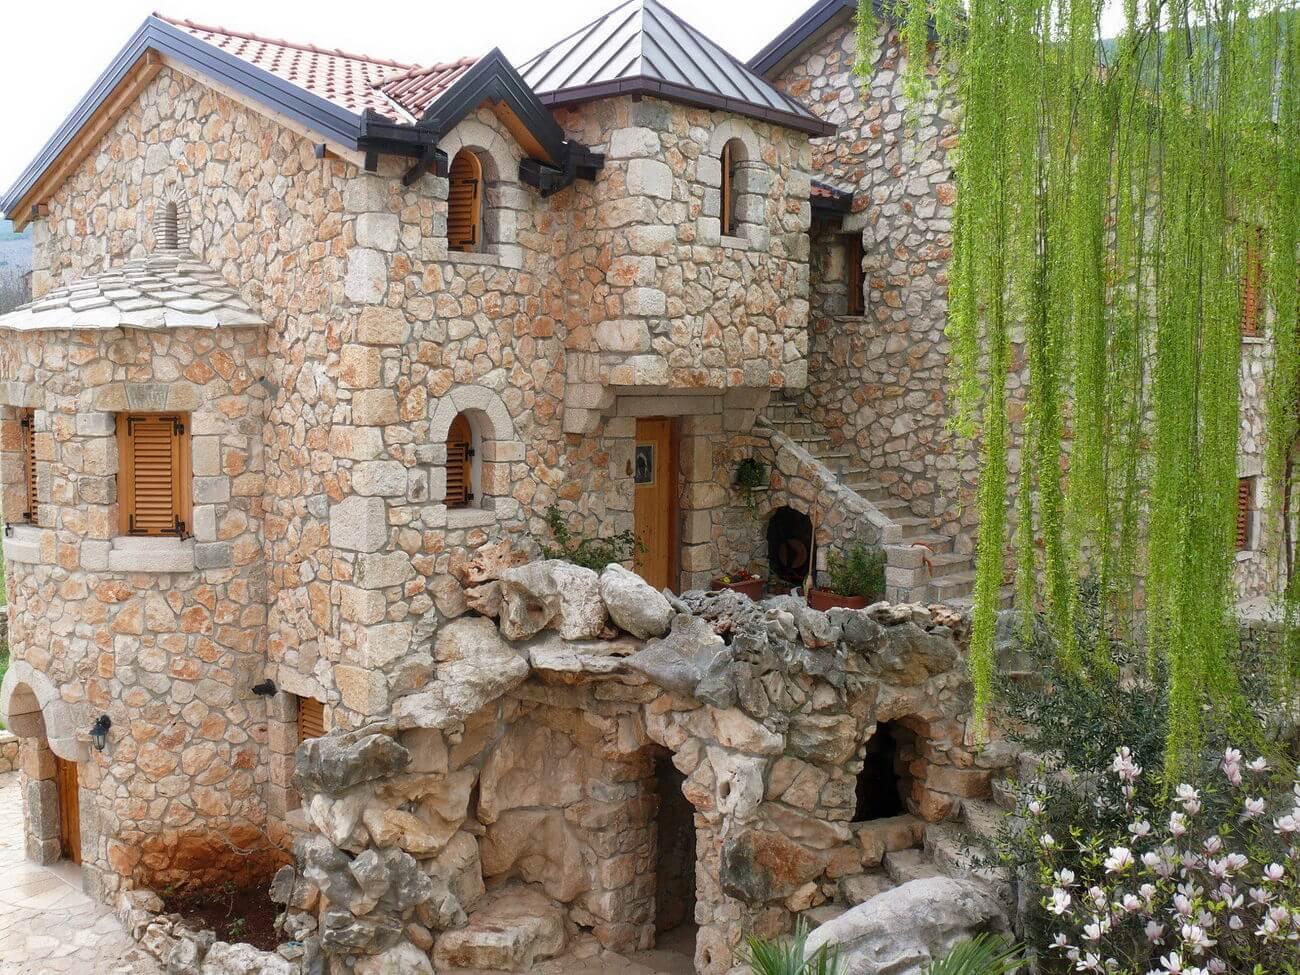 Дом в стиле замка своими руками 49